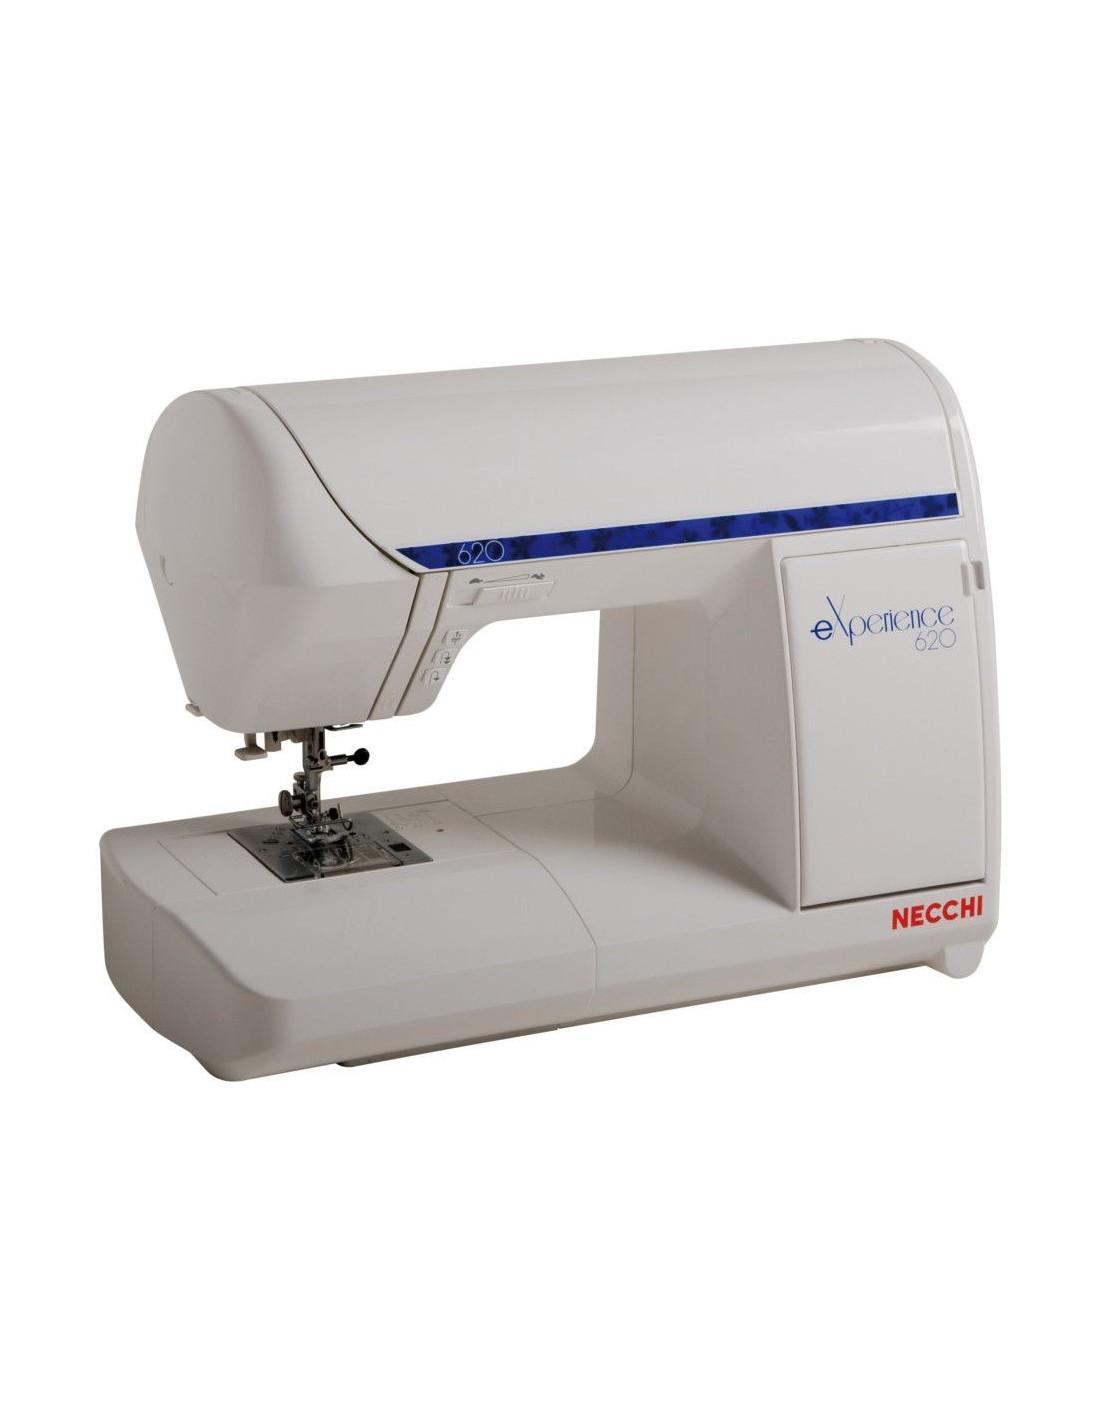 Macchina per cucire necchi 620 experience macchine da for Ipercoop macchina da cucire